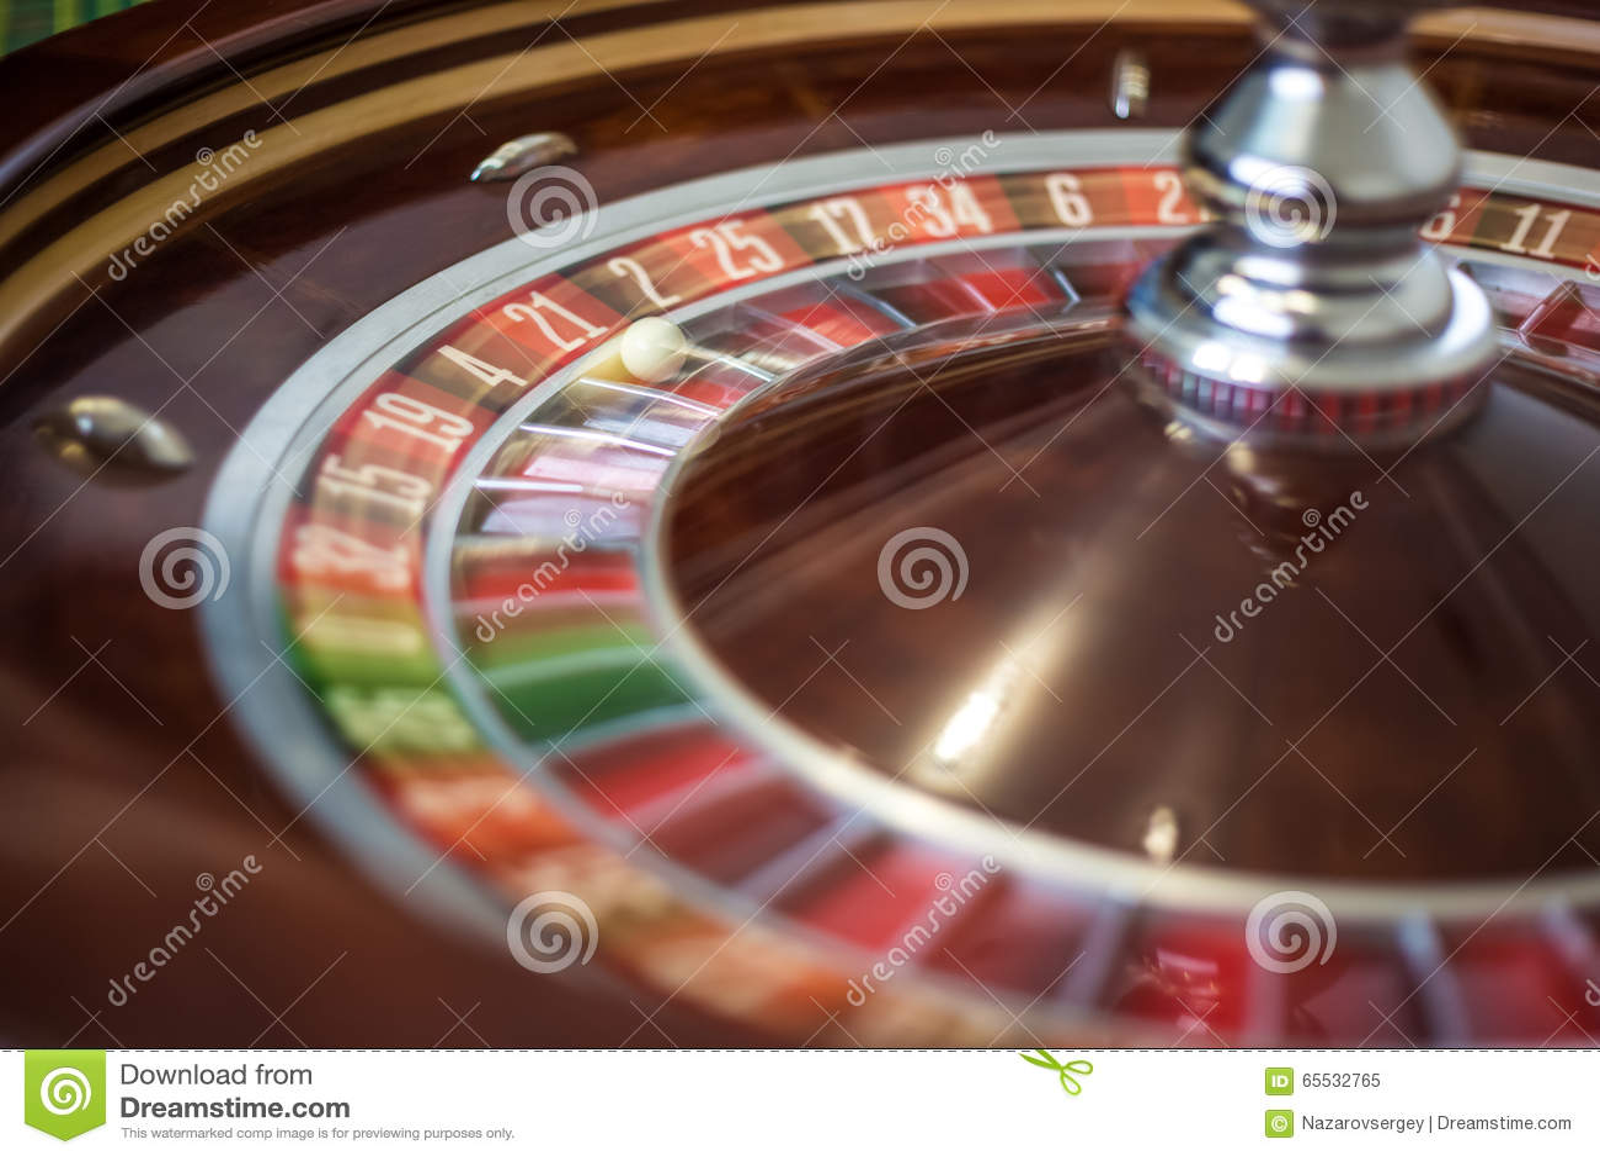 Red 7 casino roulette